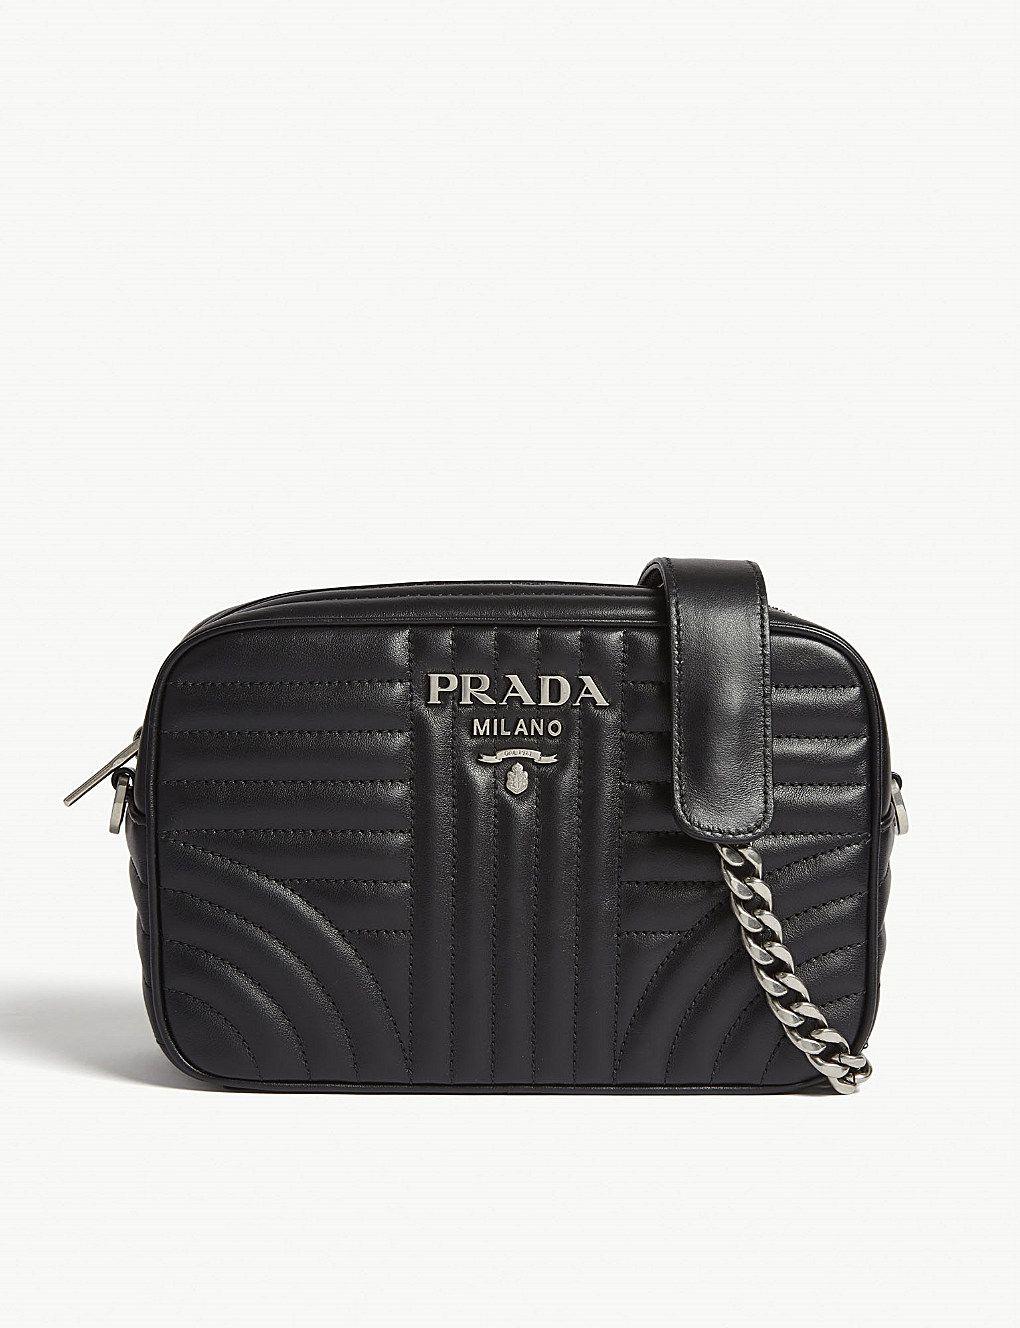 5baec879eab408 PRADA Diagramme leather shoulder bag in 2019 | Luxury Handbags ...